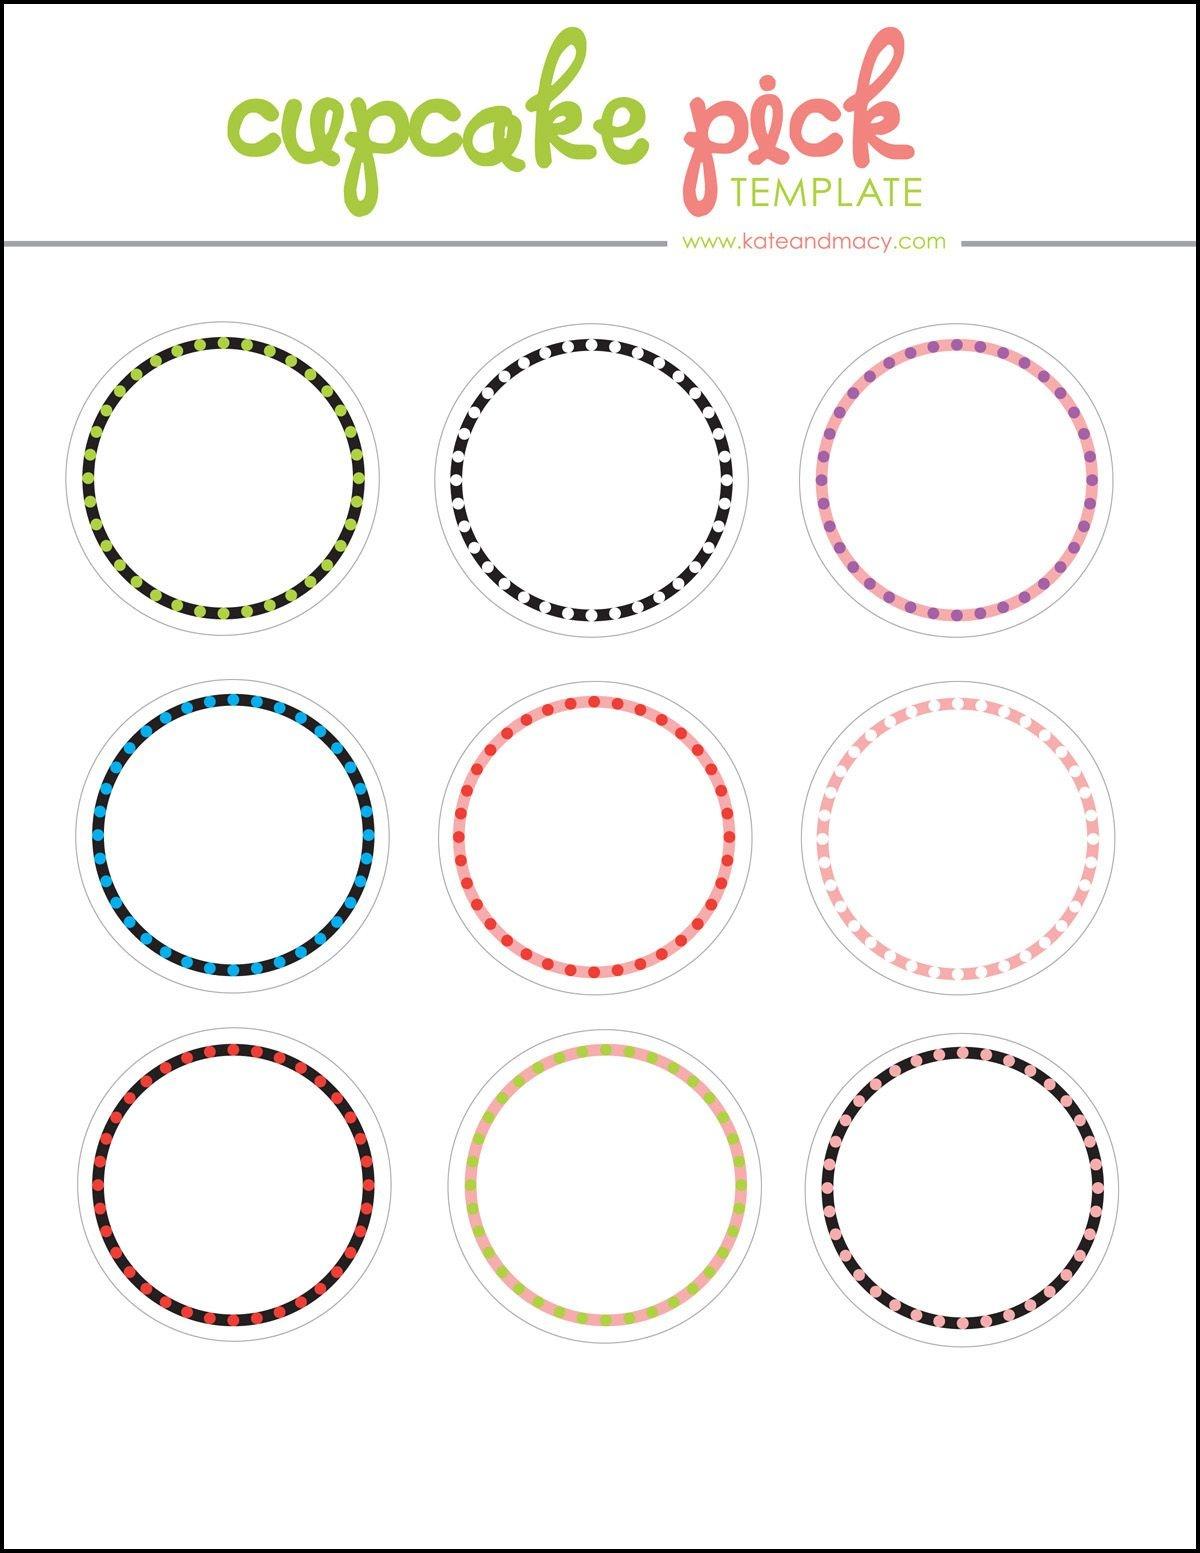 Kate: Free Digital Cupcake Pick Topper Template | Printables | 40Th - Free Printable Cupcake Toppers Bridal Shower